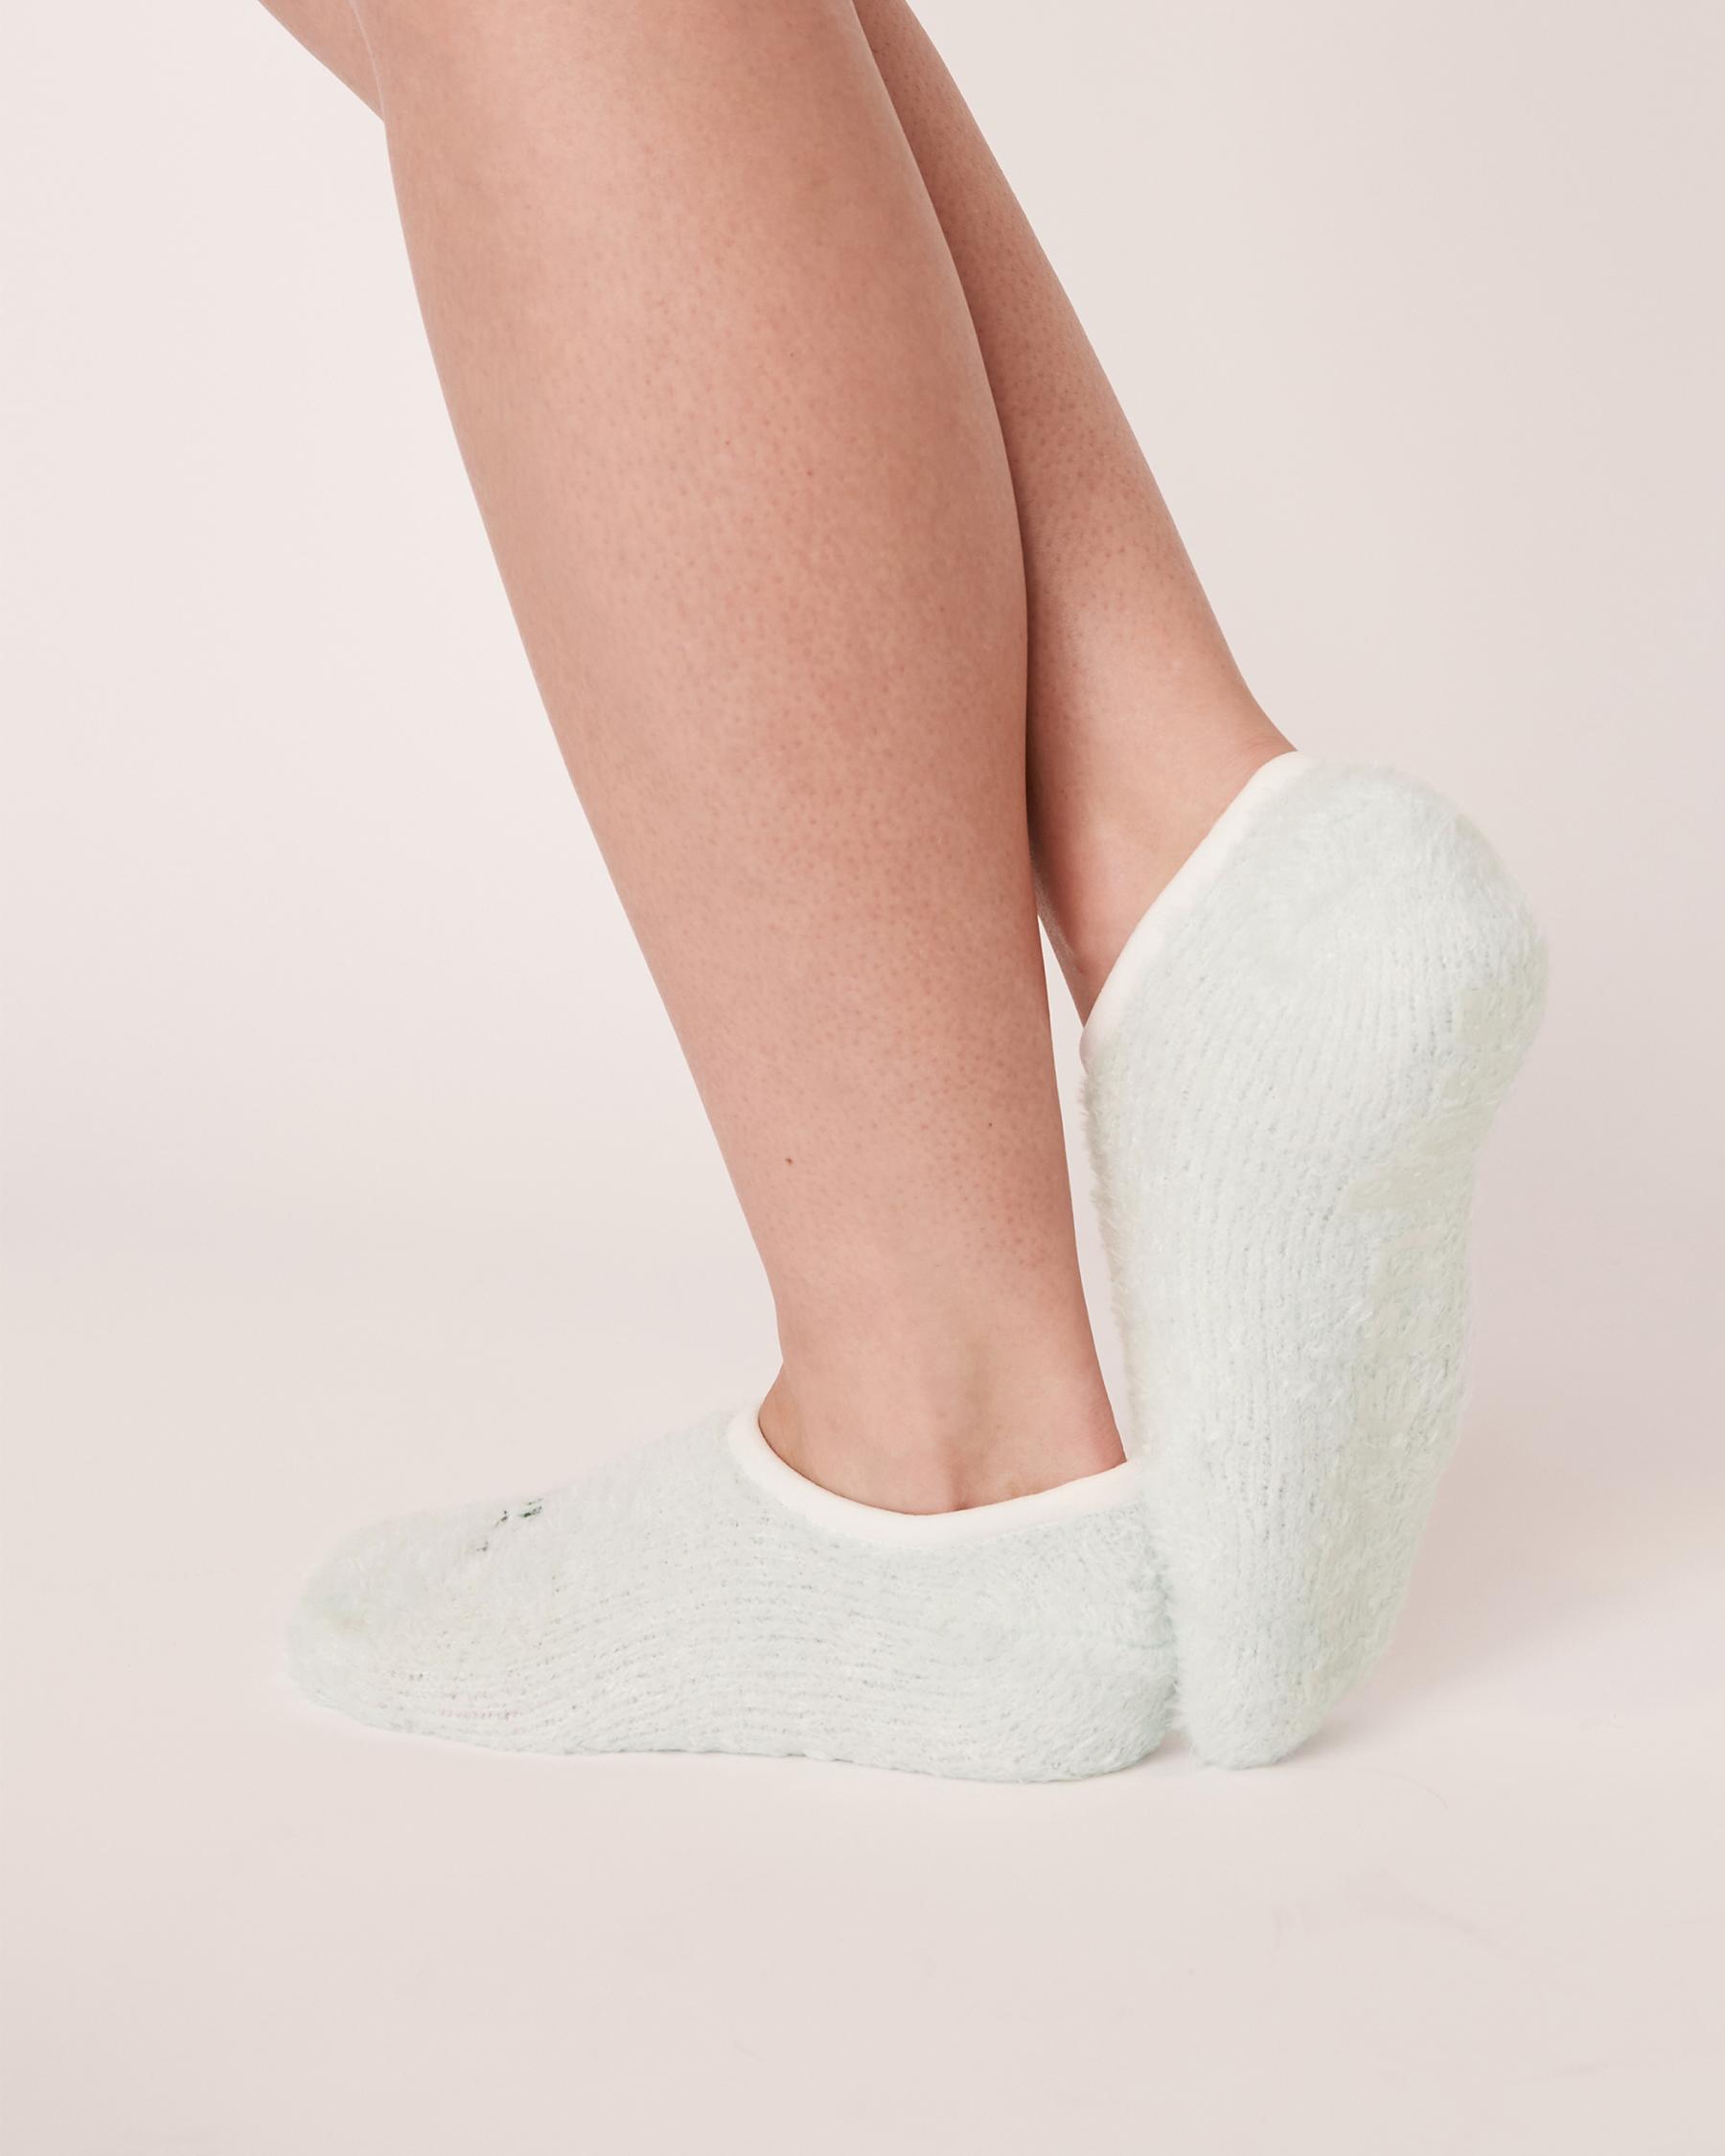 LA VIE EN ROSE Embroidery Slippers Socks Light aqua 40700083 - View2